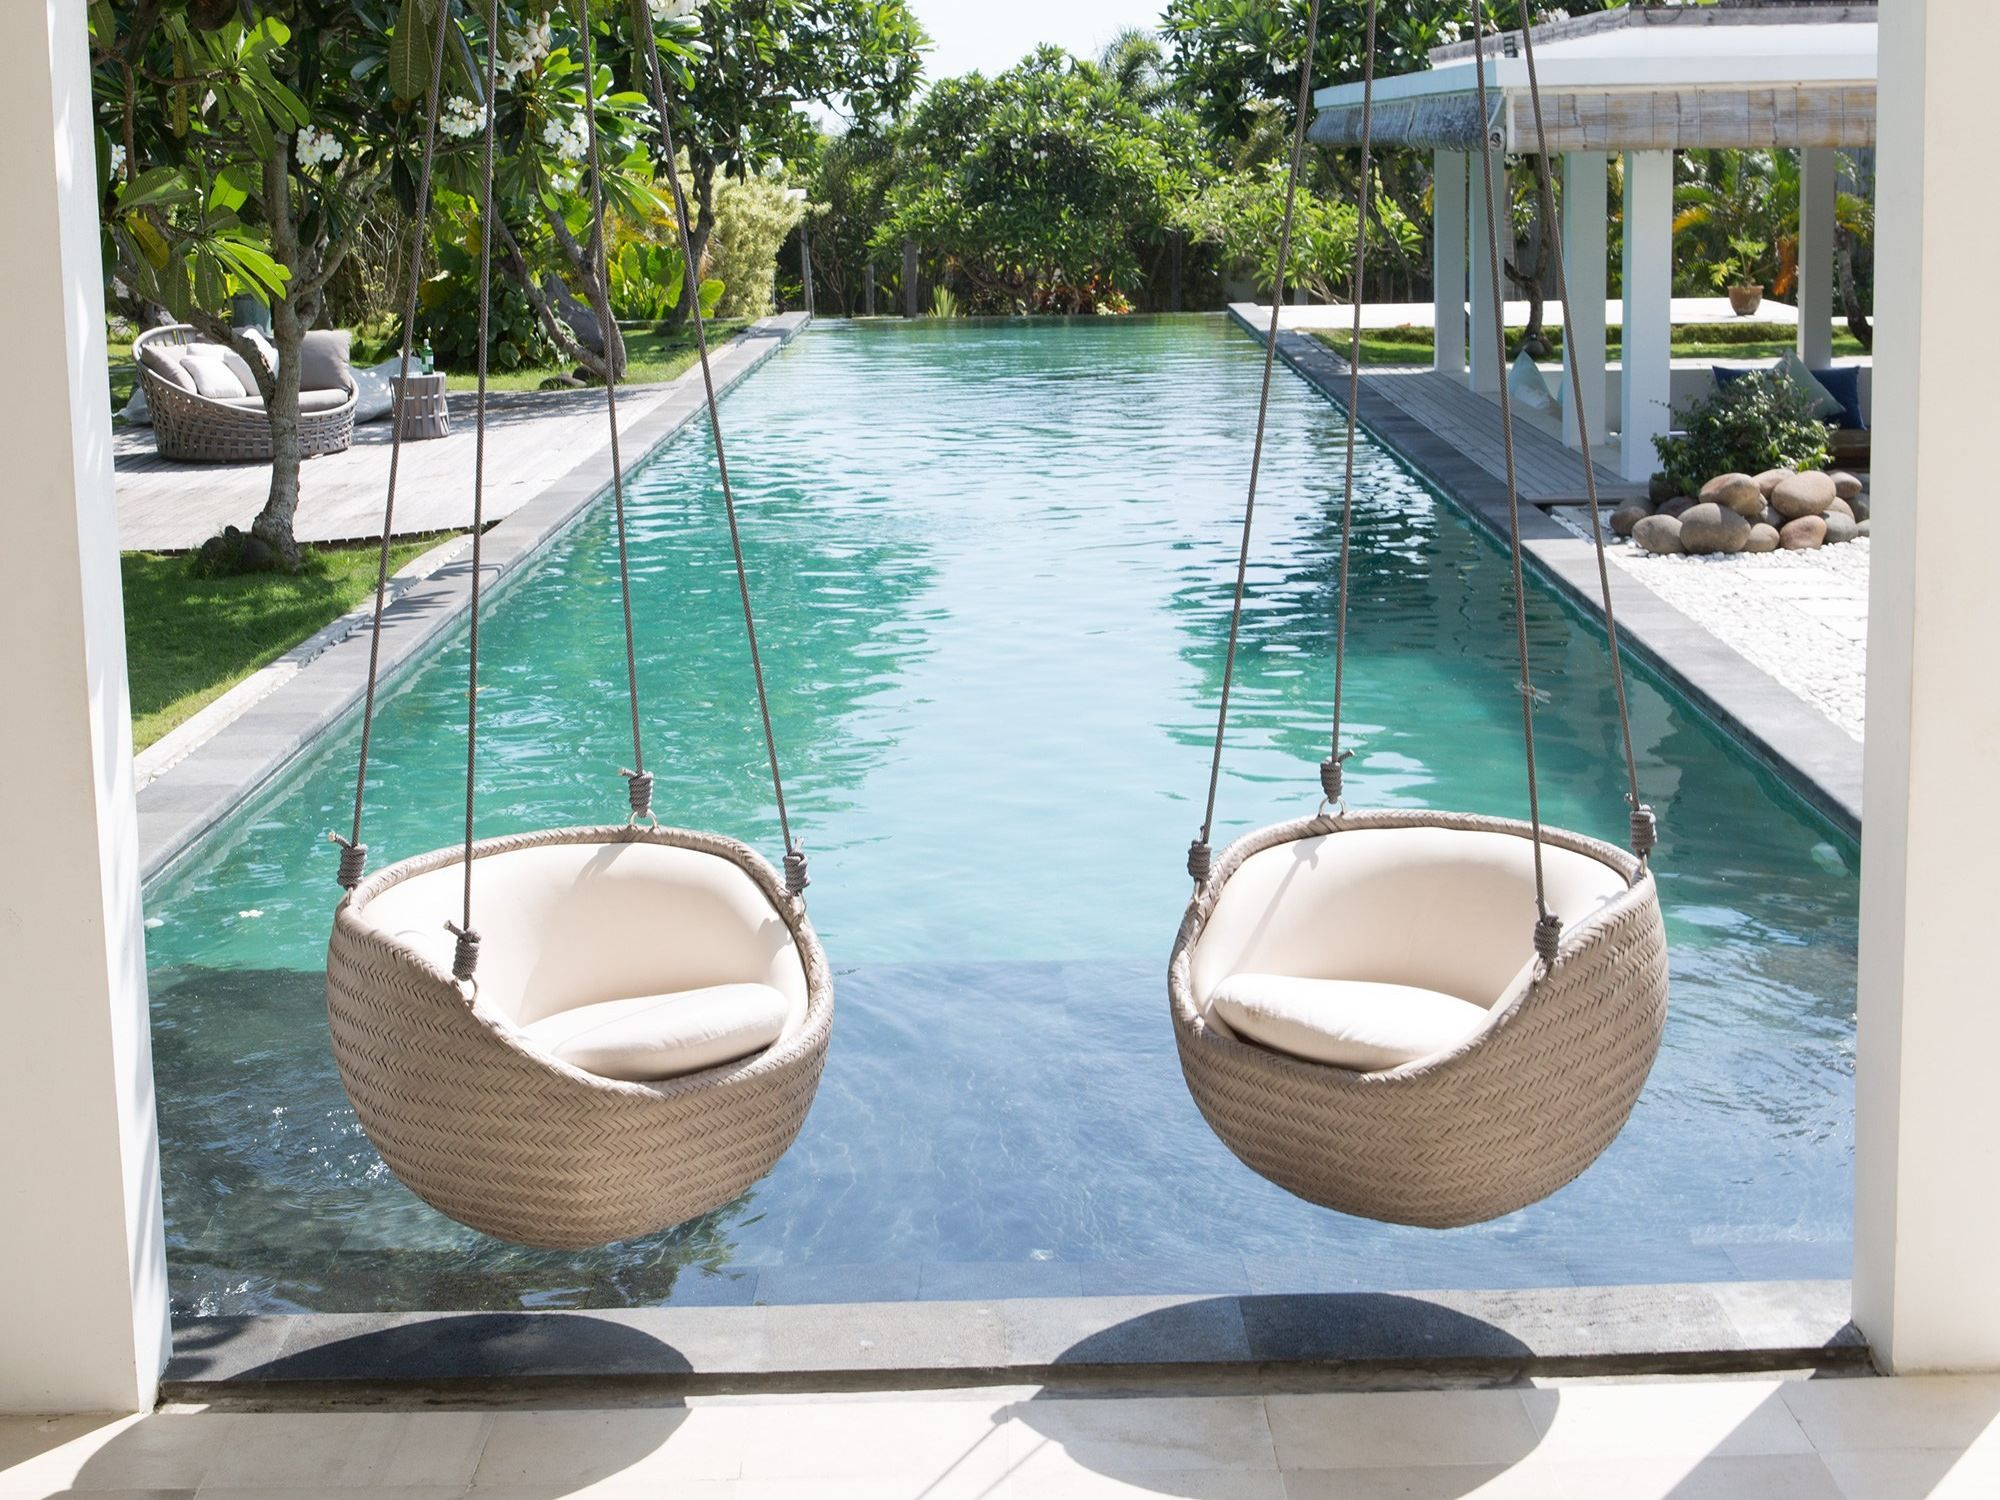 Sill n colgante de jard n hanging chair by skyline design - Sillon colgante jardin ...